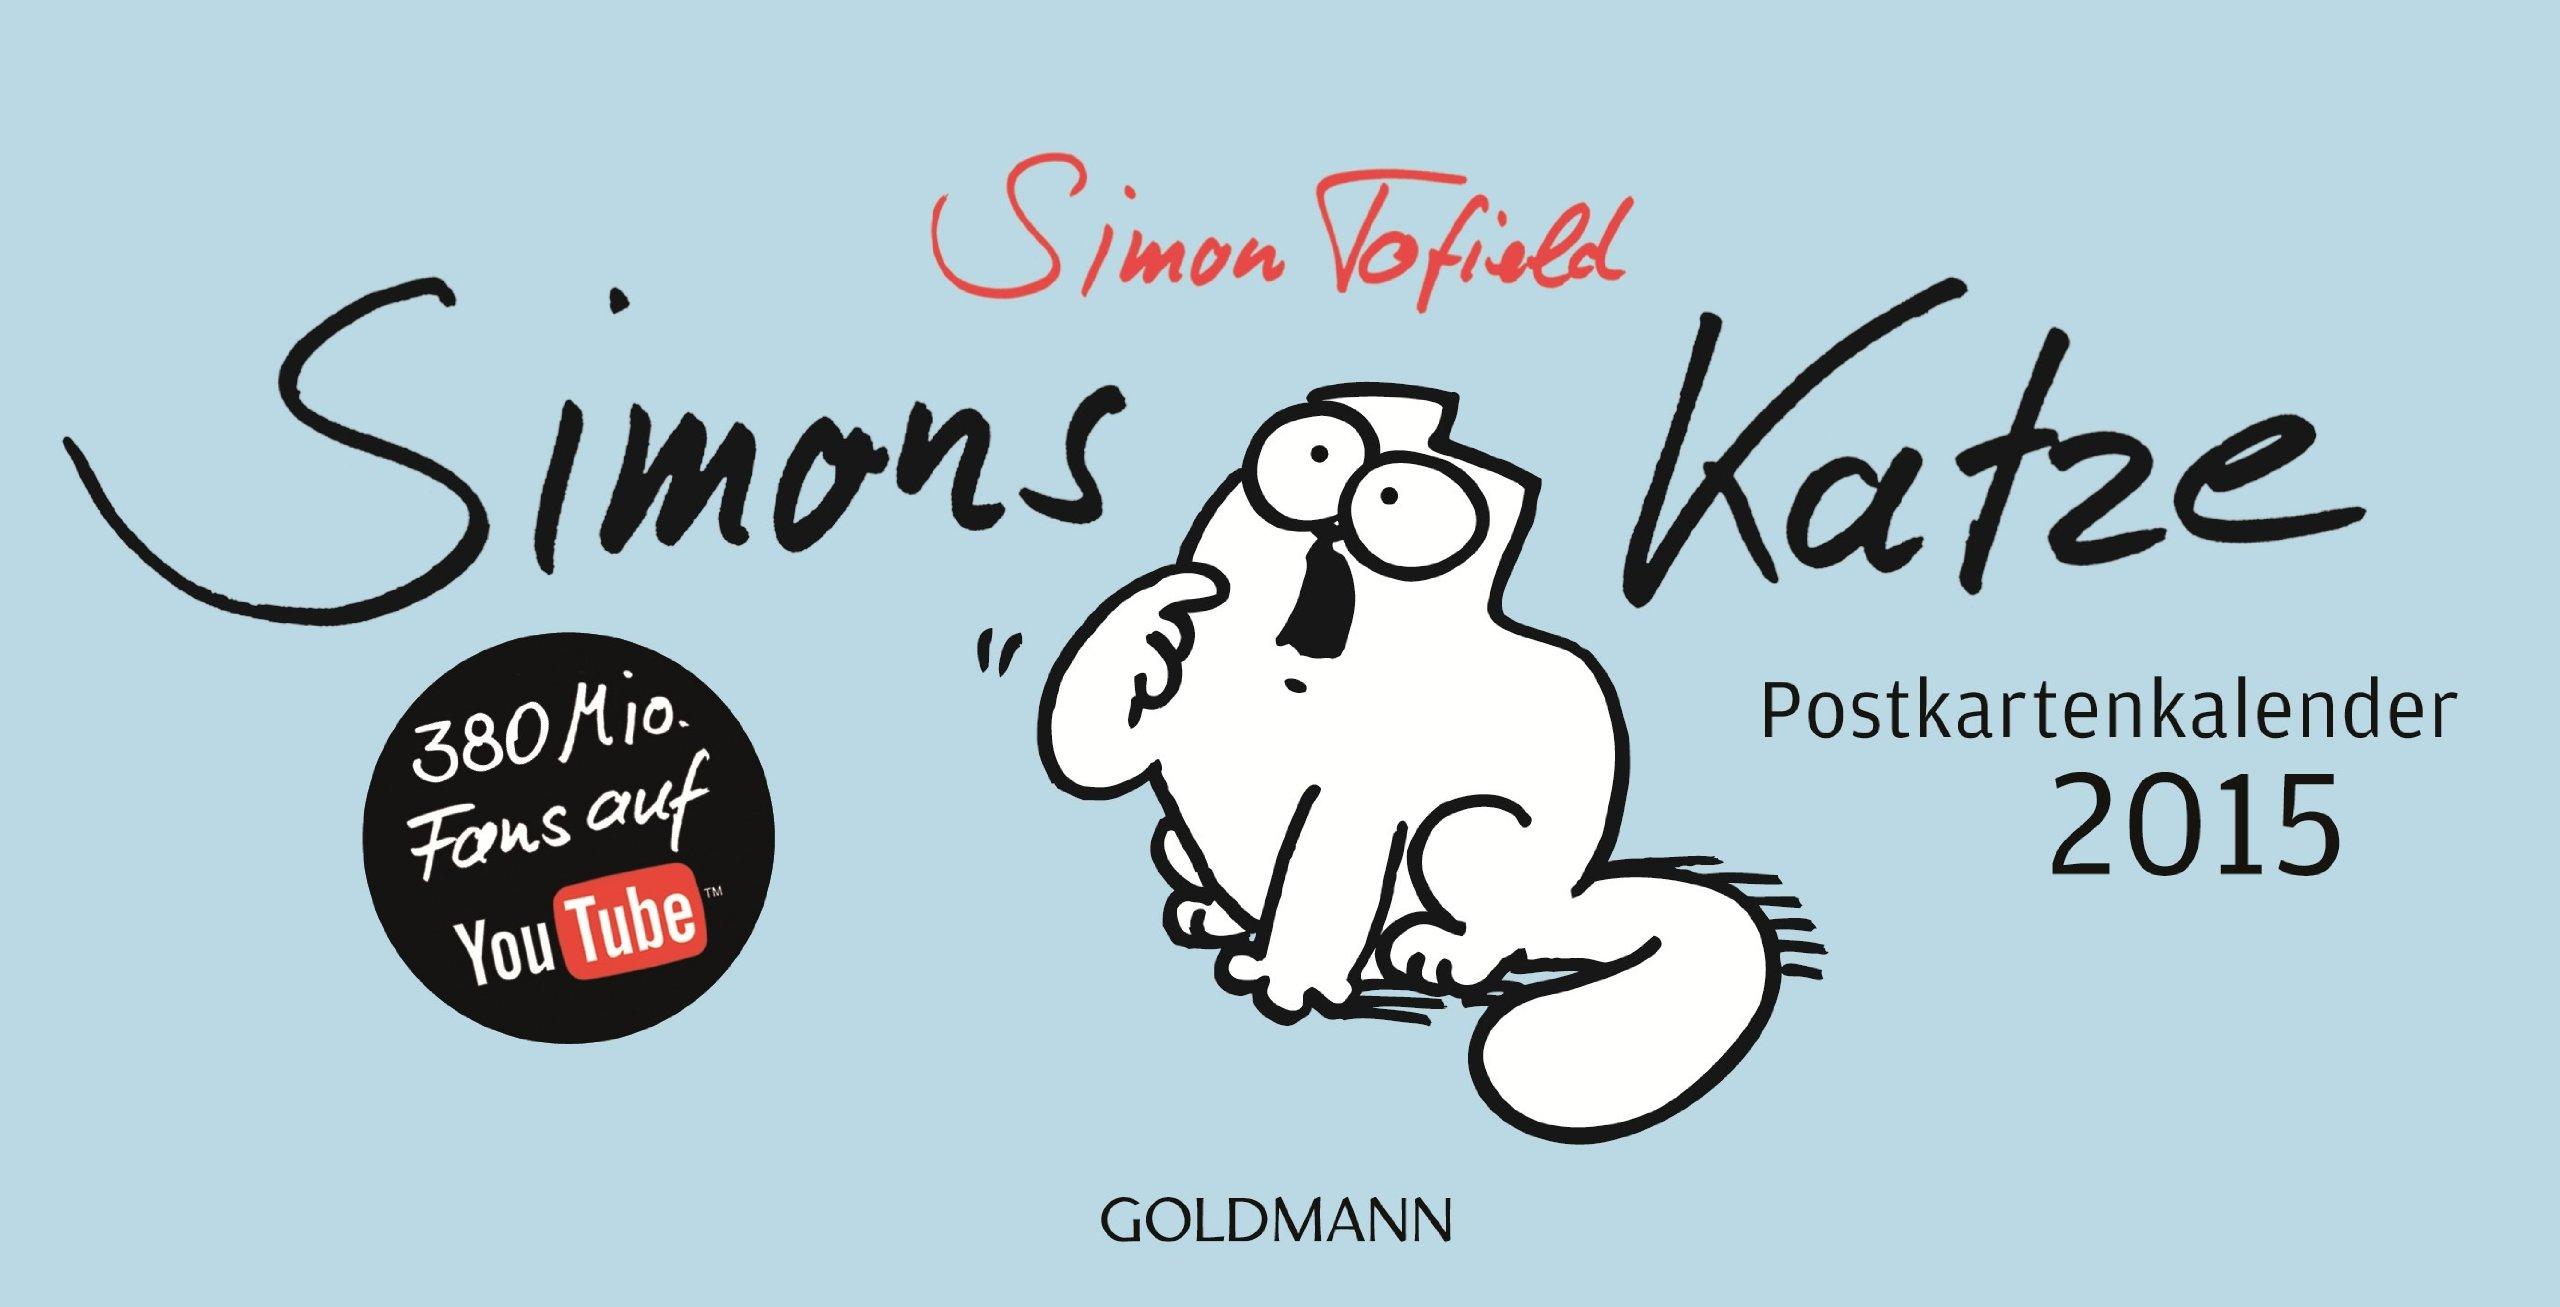 Simons Katze - Postkartenkalender 2015